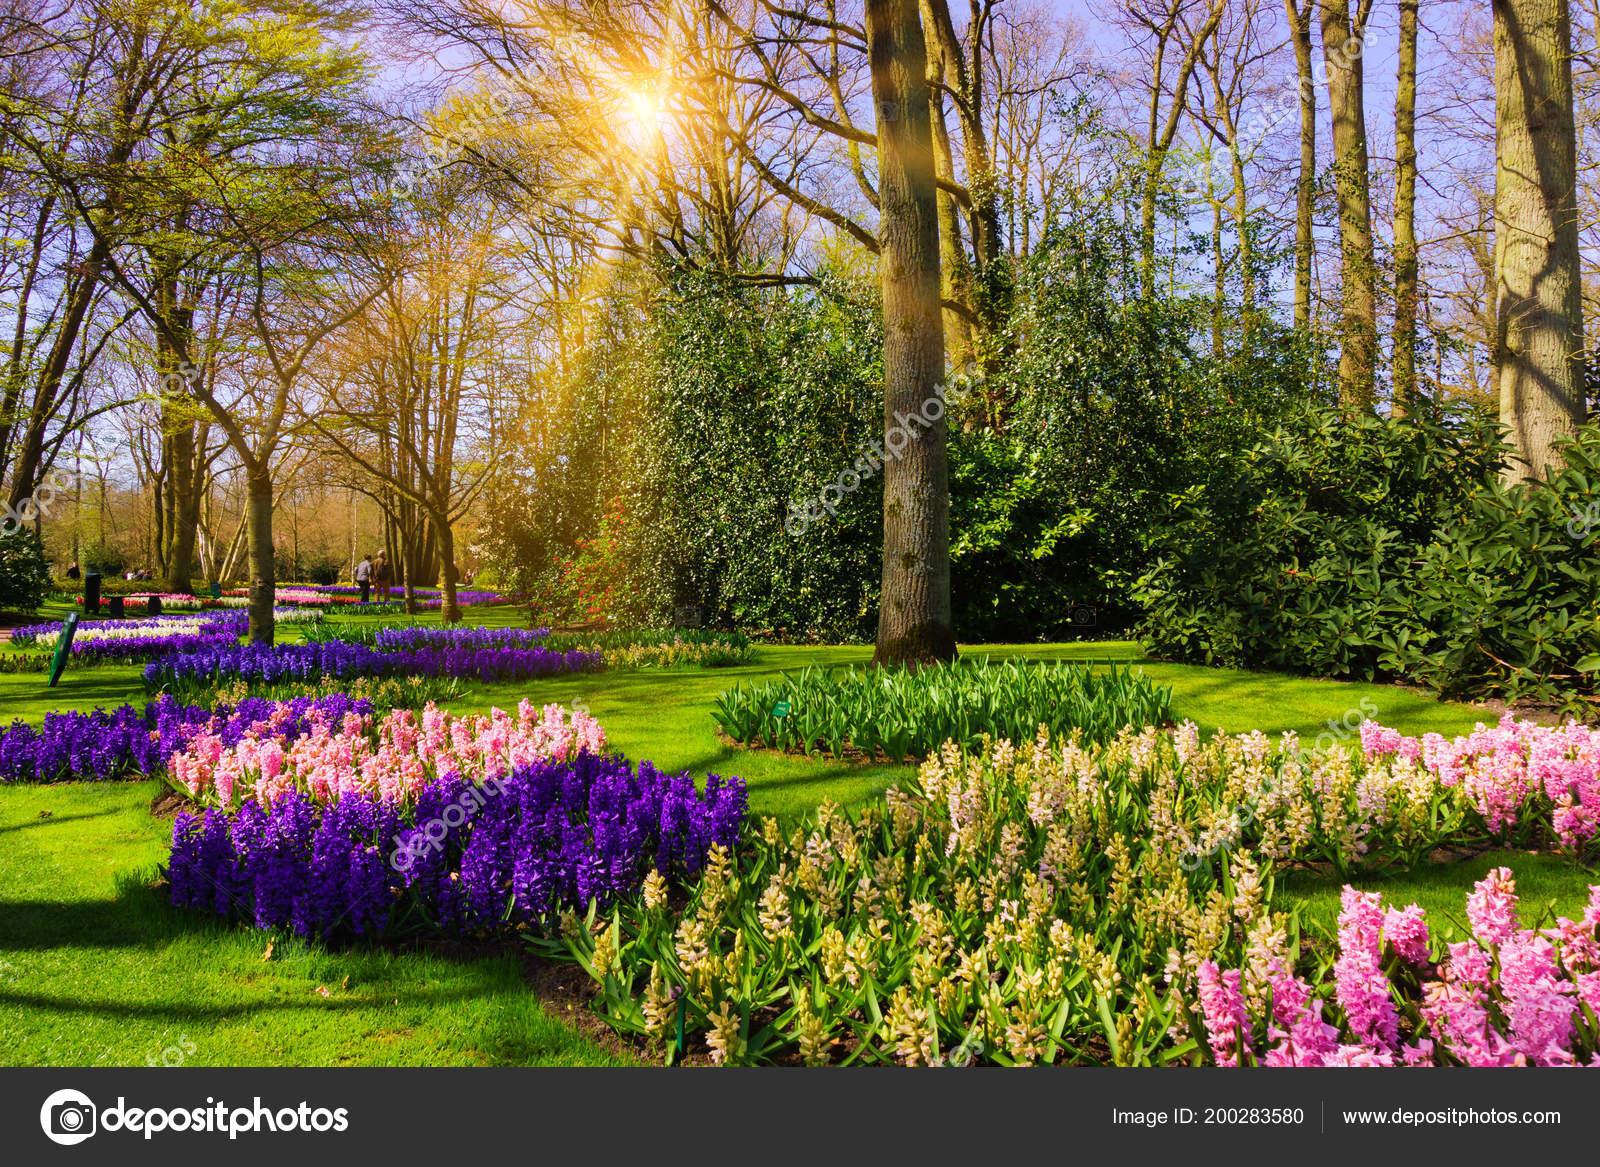 Imagenes De Paisajes De Primavera: Hermoso Jardín Parque Primavera Paisaje Primavera